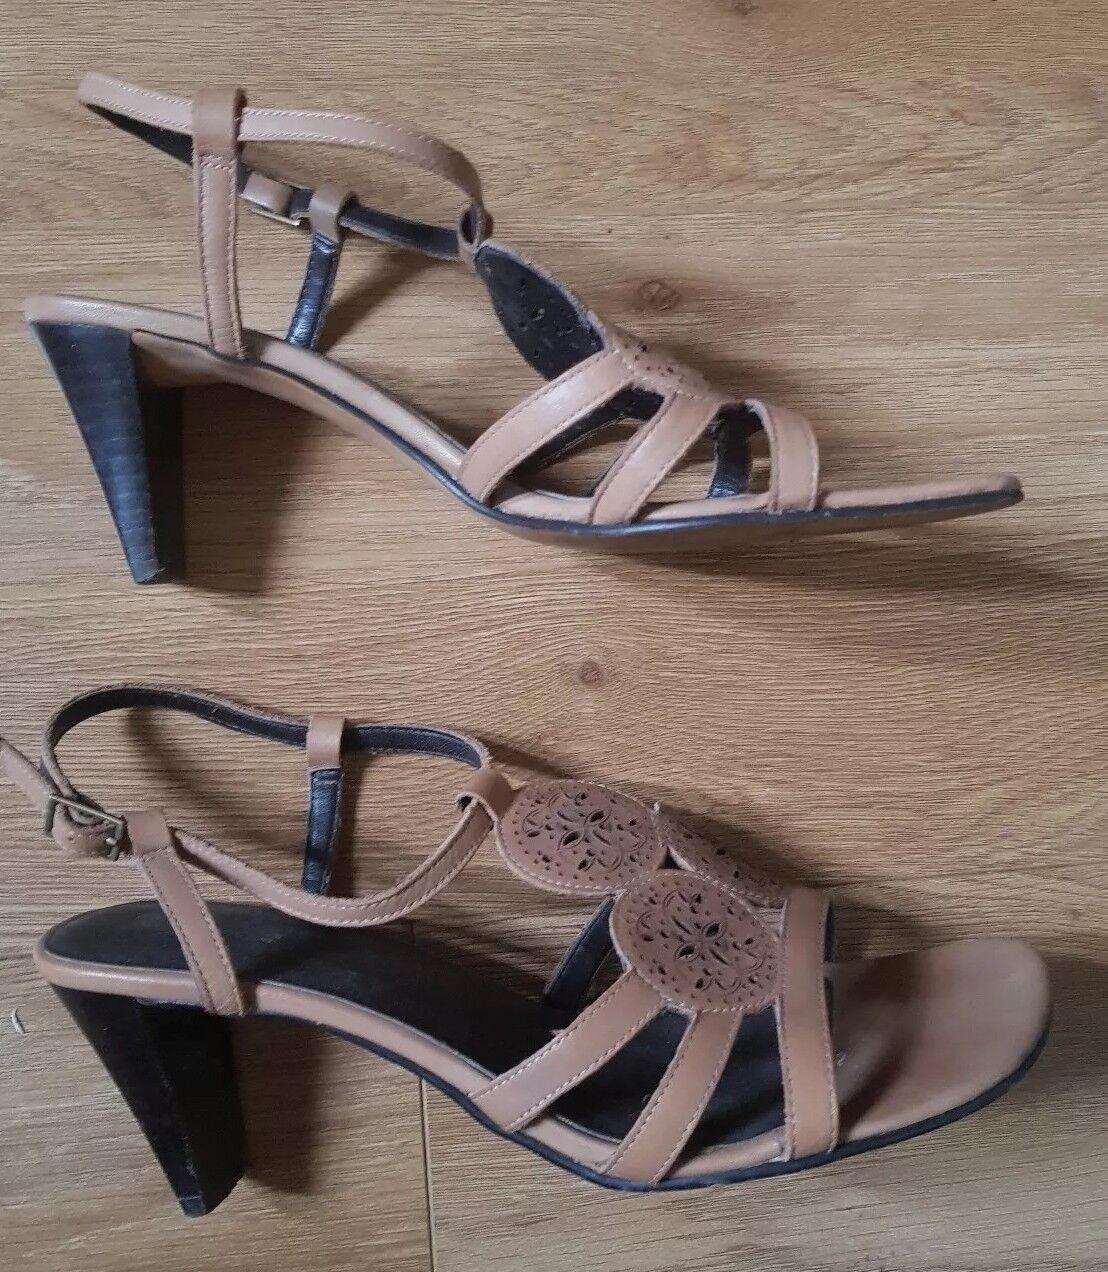 CLARKS - Ladies smart leather sandals , size 4.5